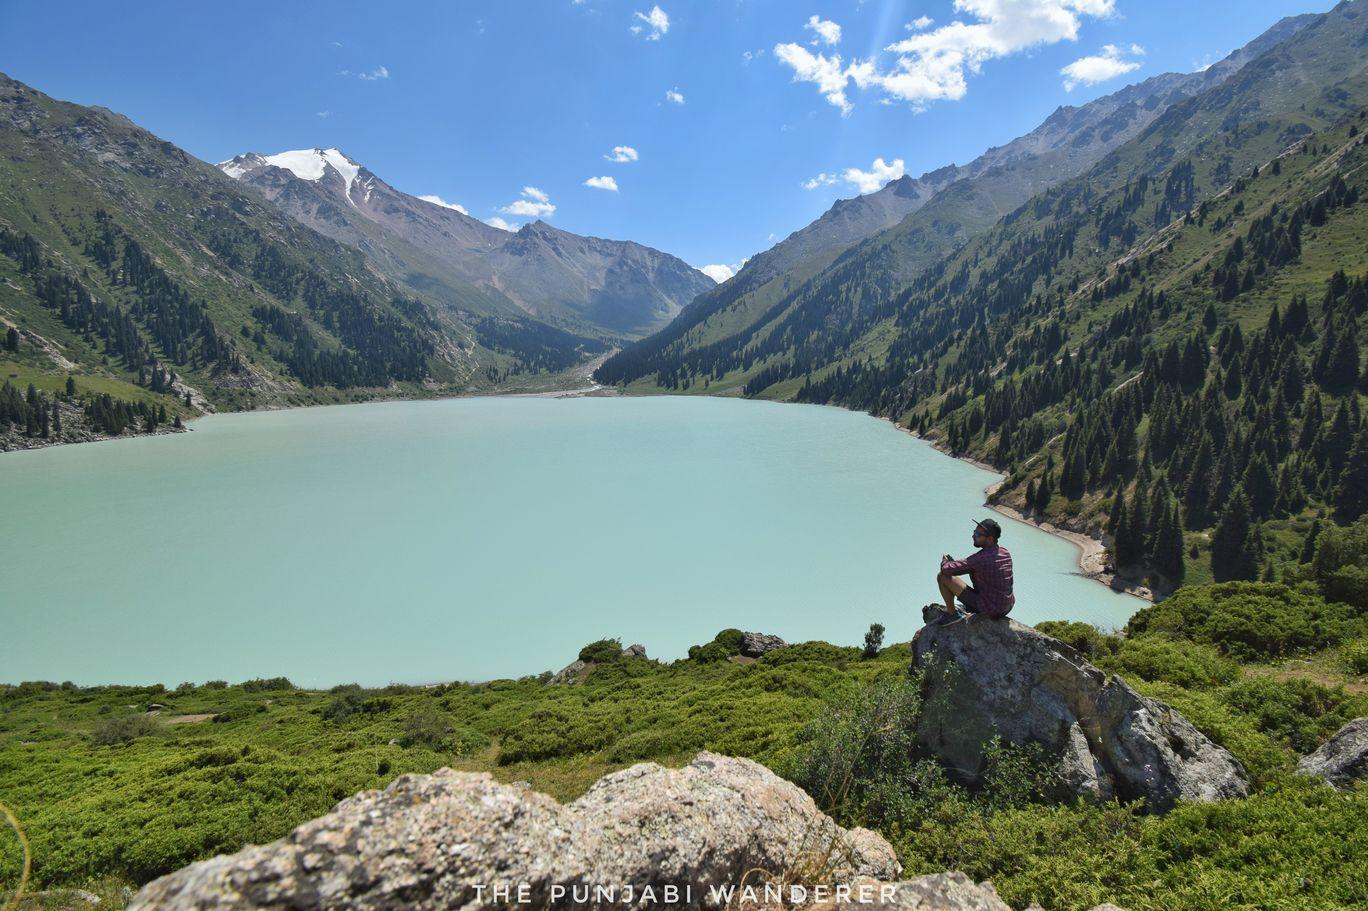 Photo of Big Almaty Lake By The Punjabi Wanderer